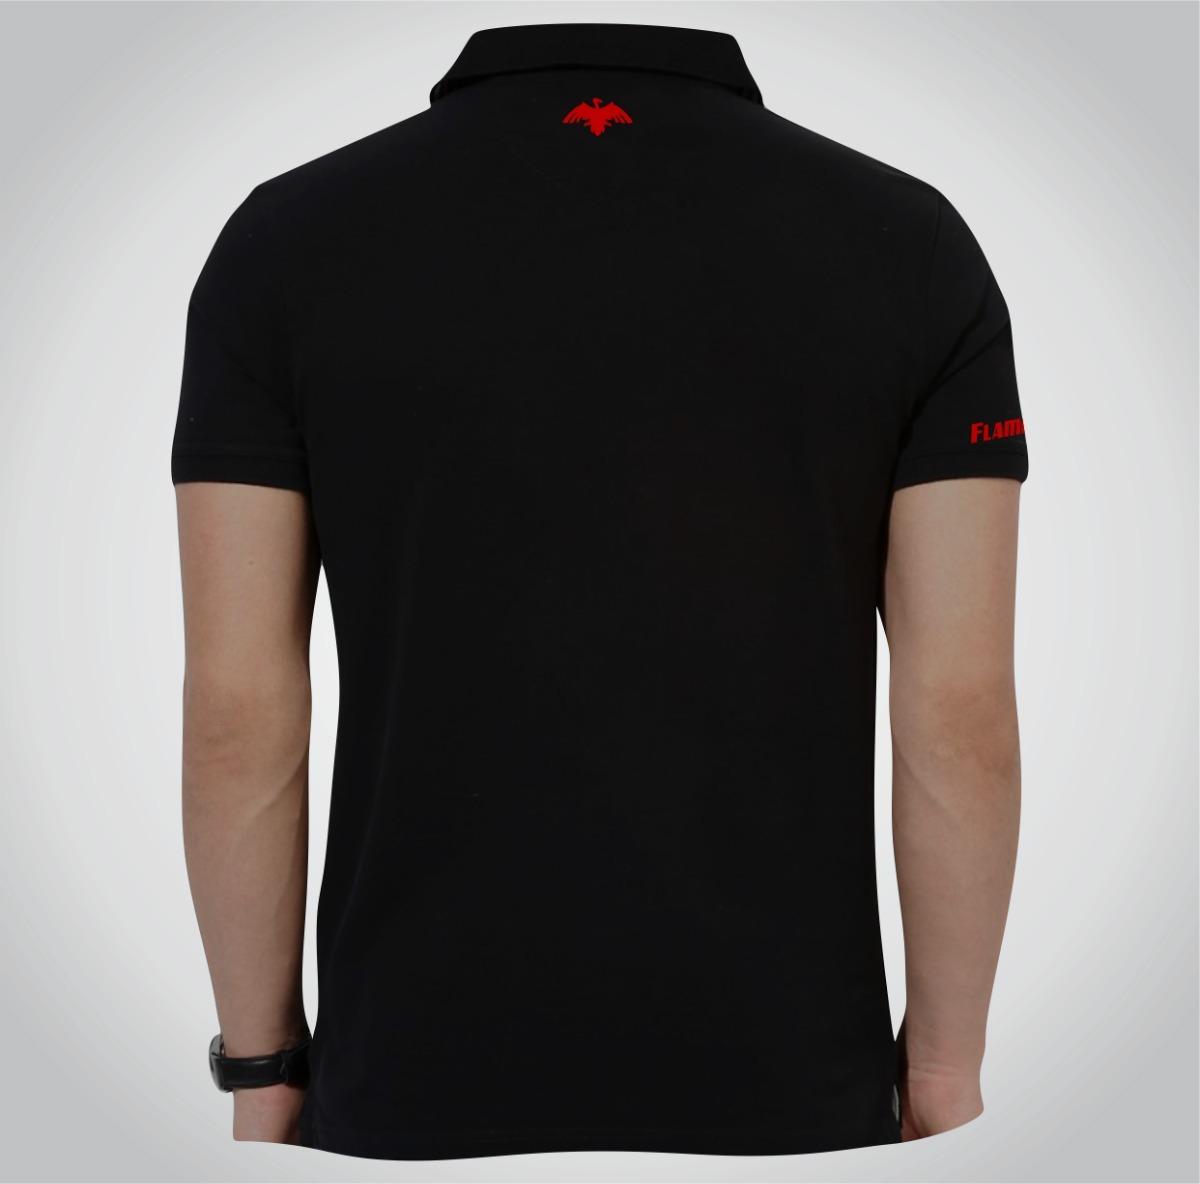 Camisa Polo Flamengo Branca Ou Preta Torcedor Ou Social Fla - R  54 ... 74814bfd03867